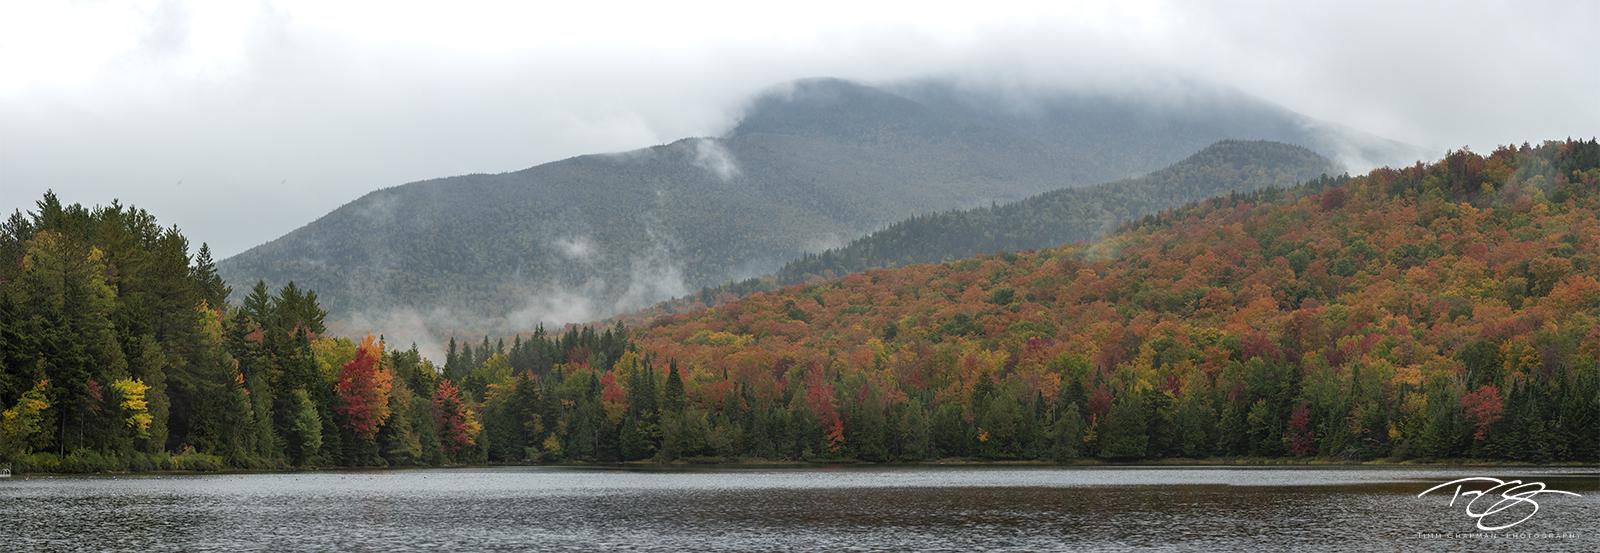 autumn, fall, colour, colours, color, colors, leaves, new england, adirondack, loj, heart lake, adirondacks, adirondack mountains, fog, mist, algonquin peak, new york, photo